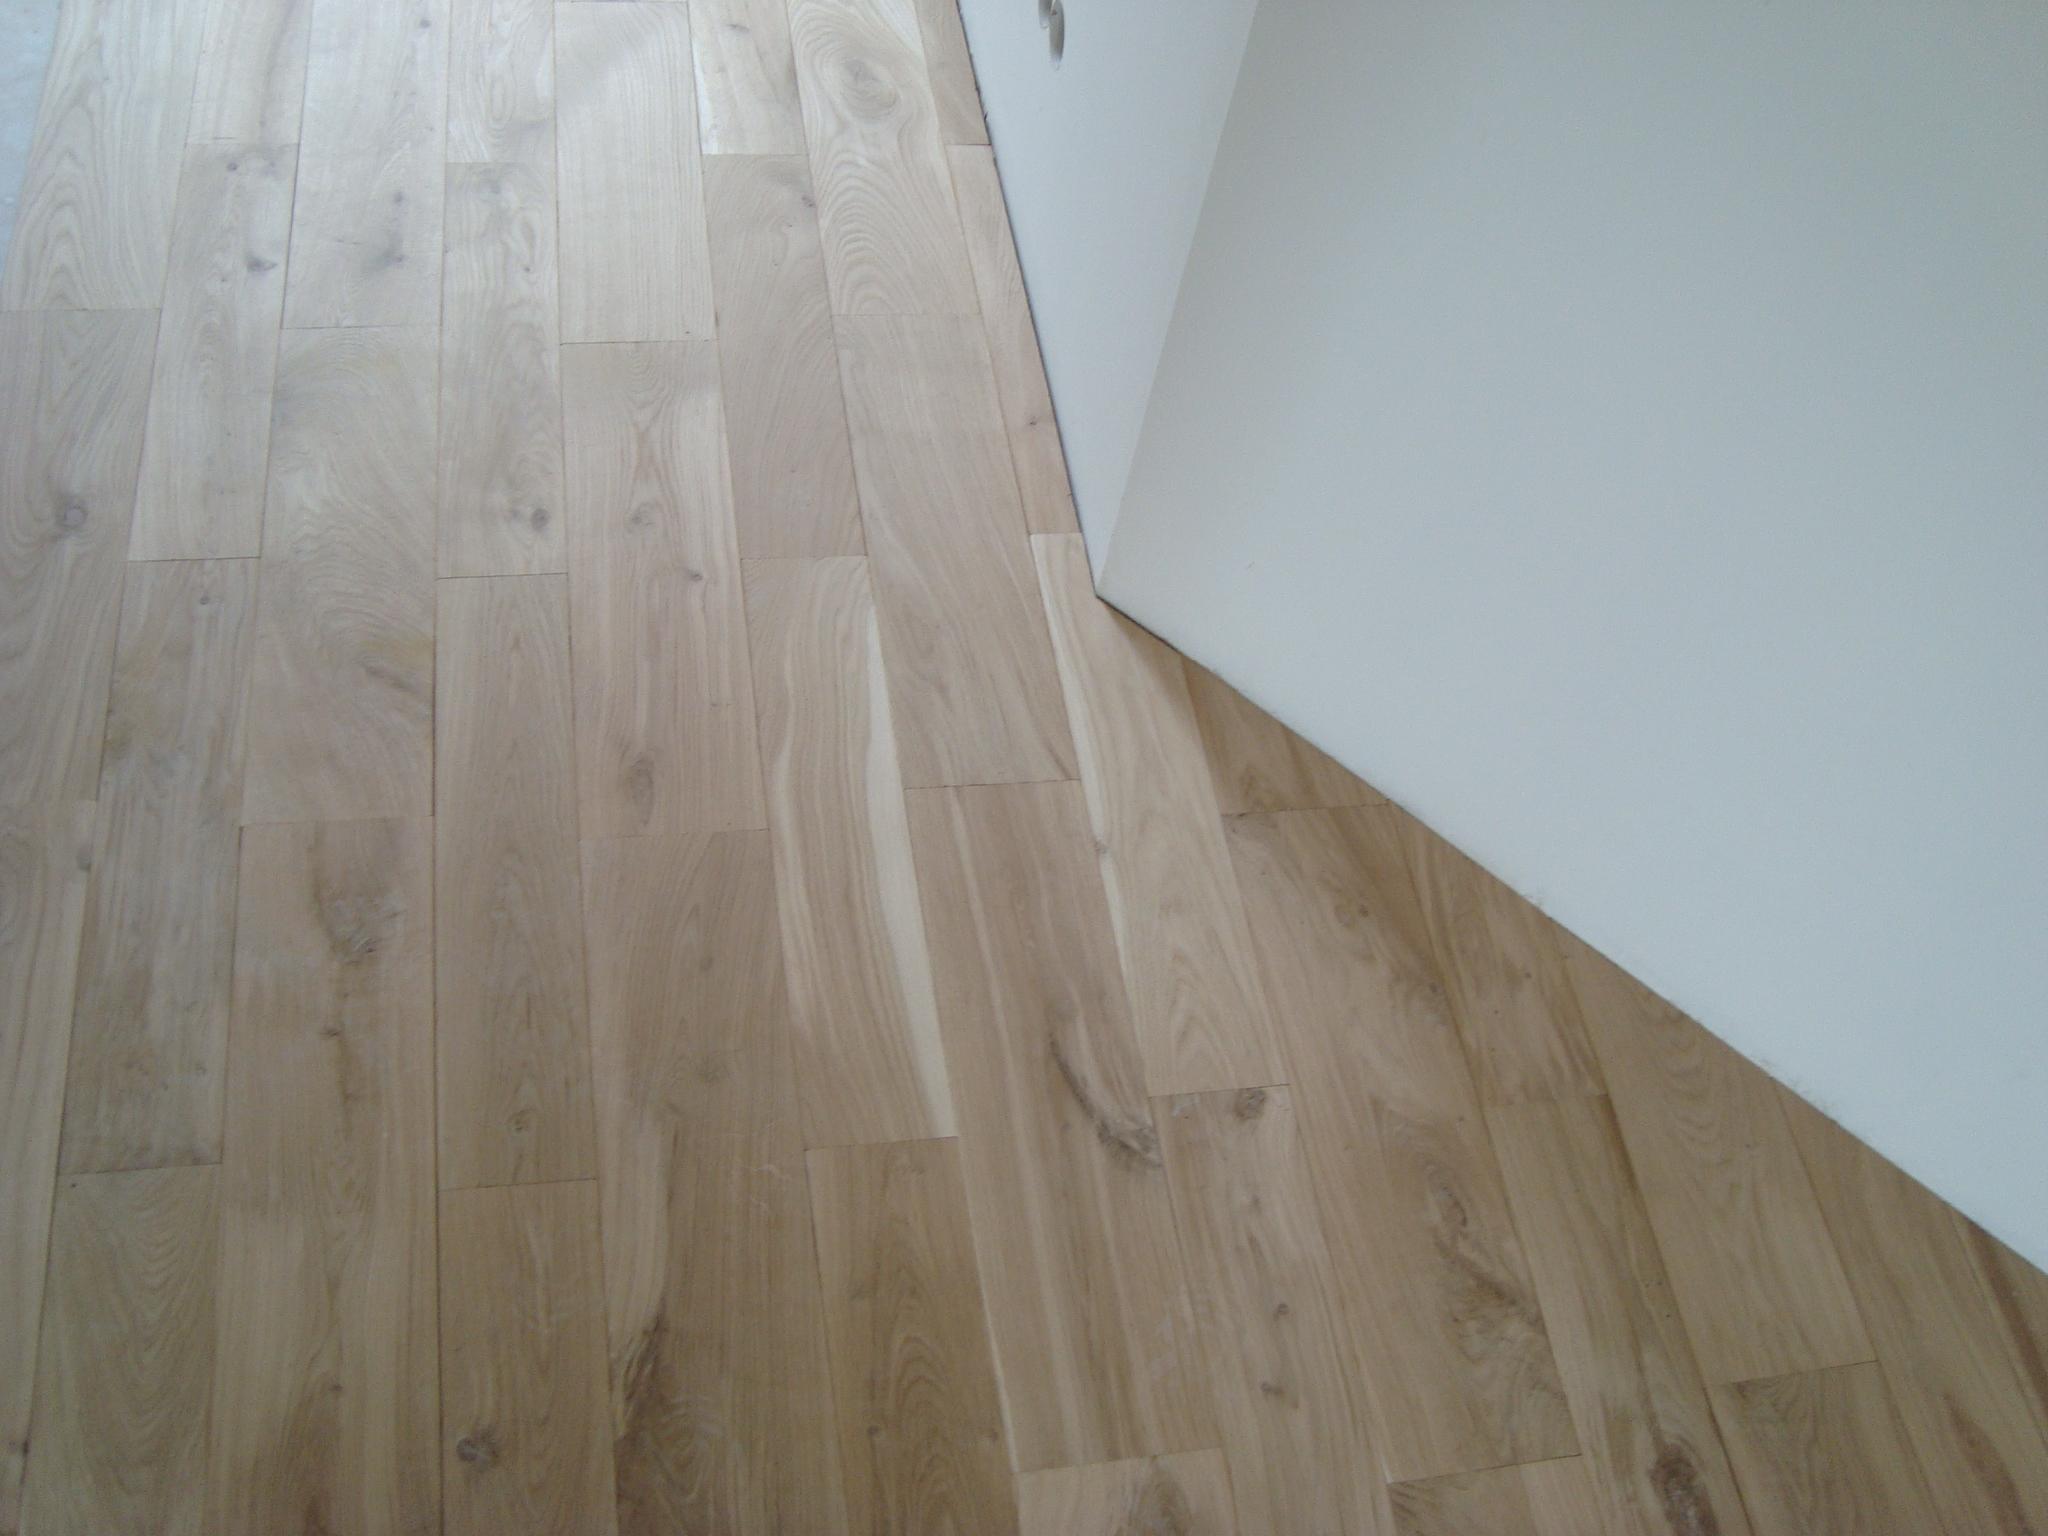 "Massiivpõrand tamm,"" Lühike Natur-Rustik"" 1MP10 | Solid wood flooring Oak Natur Rustic Short1"